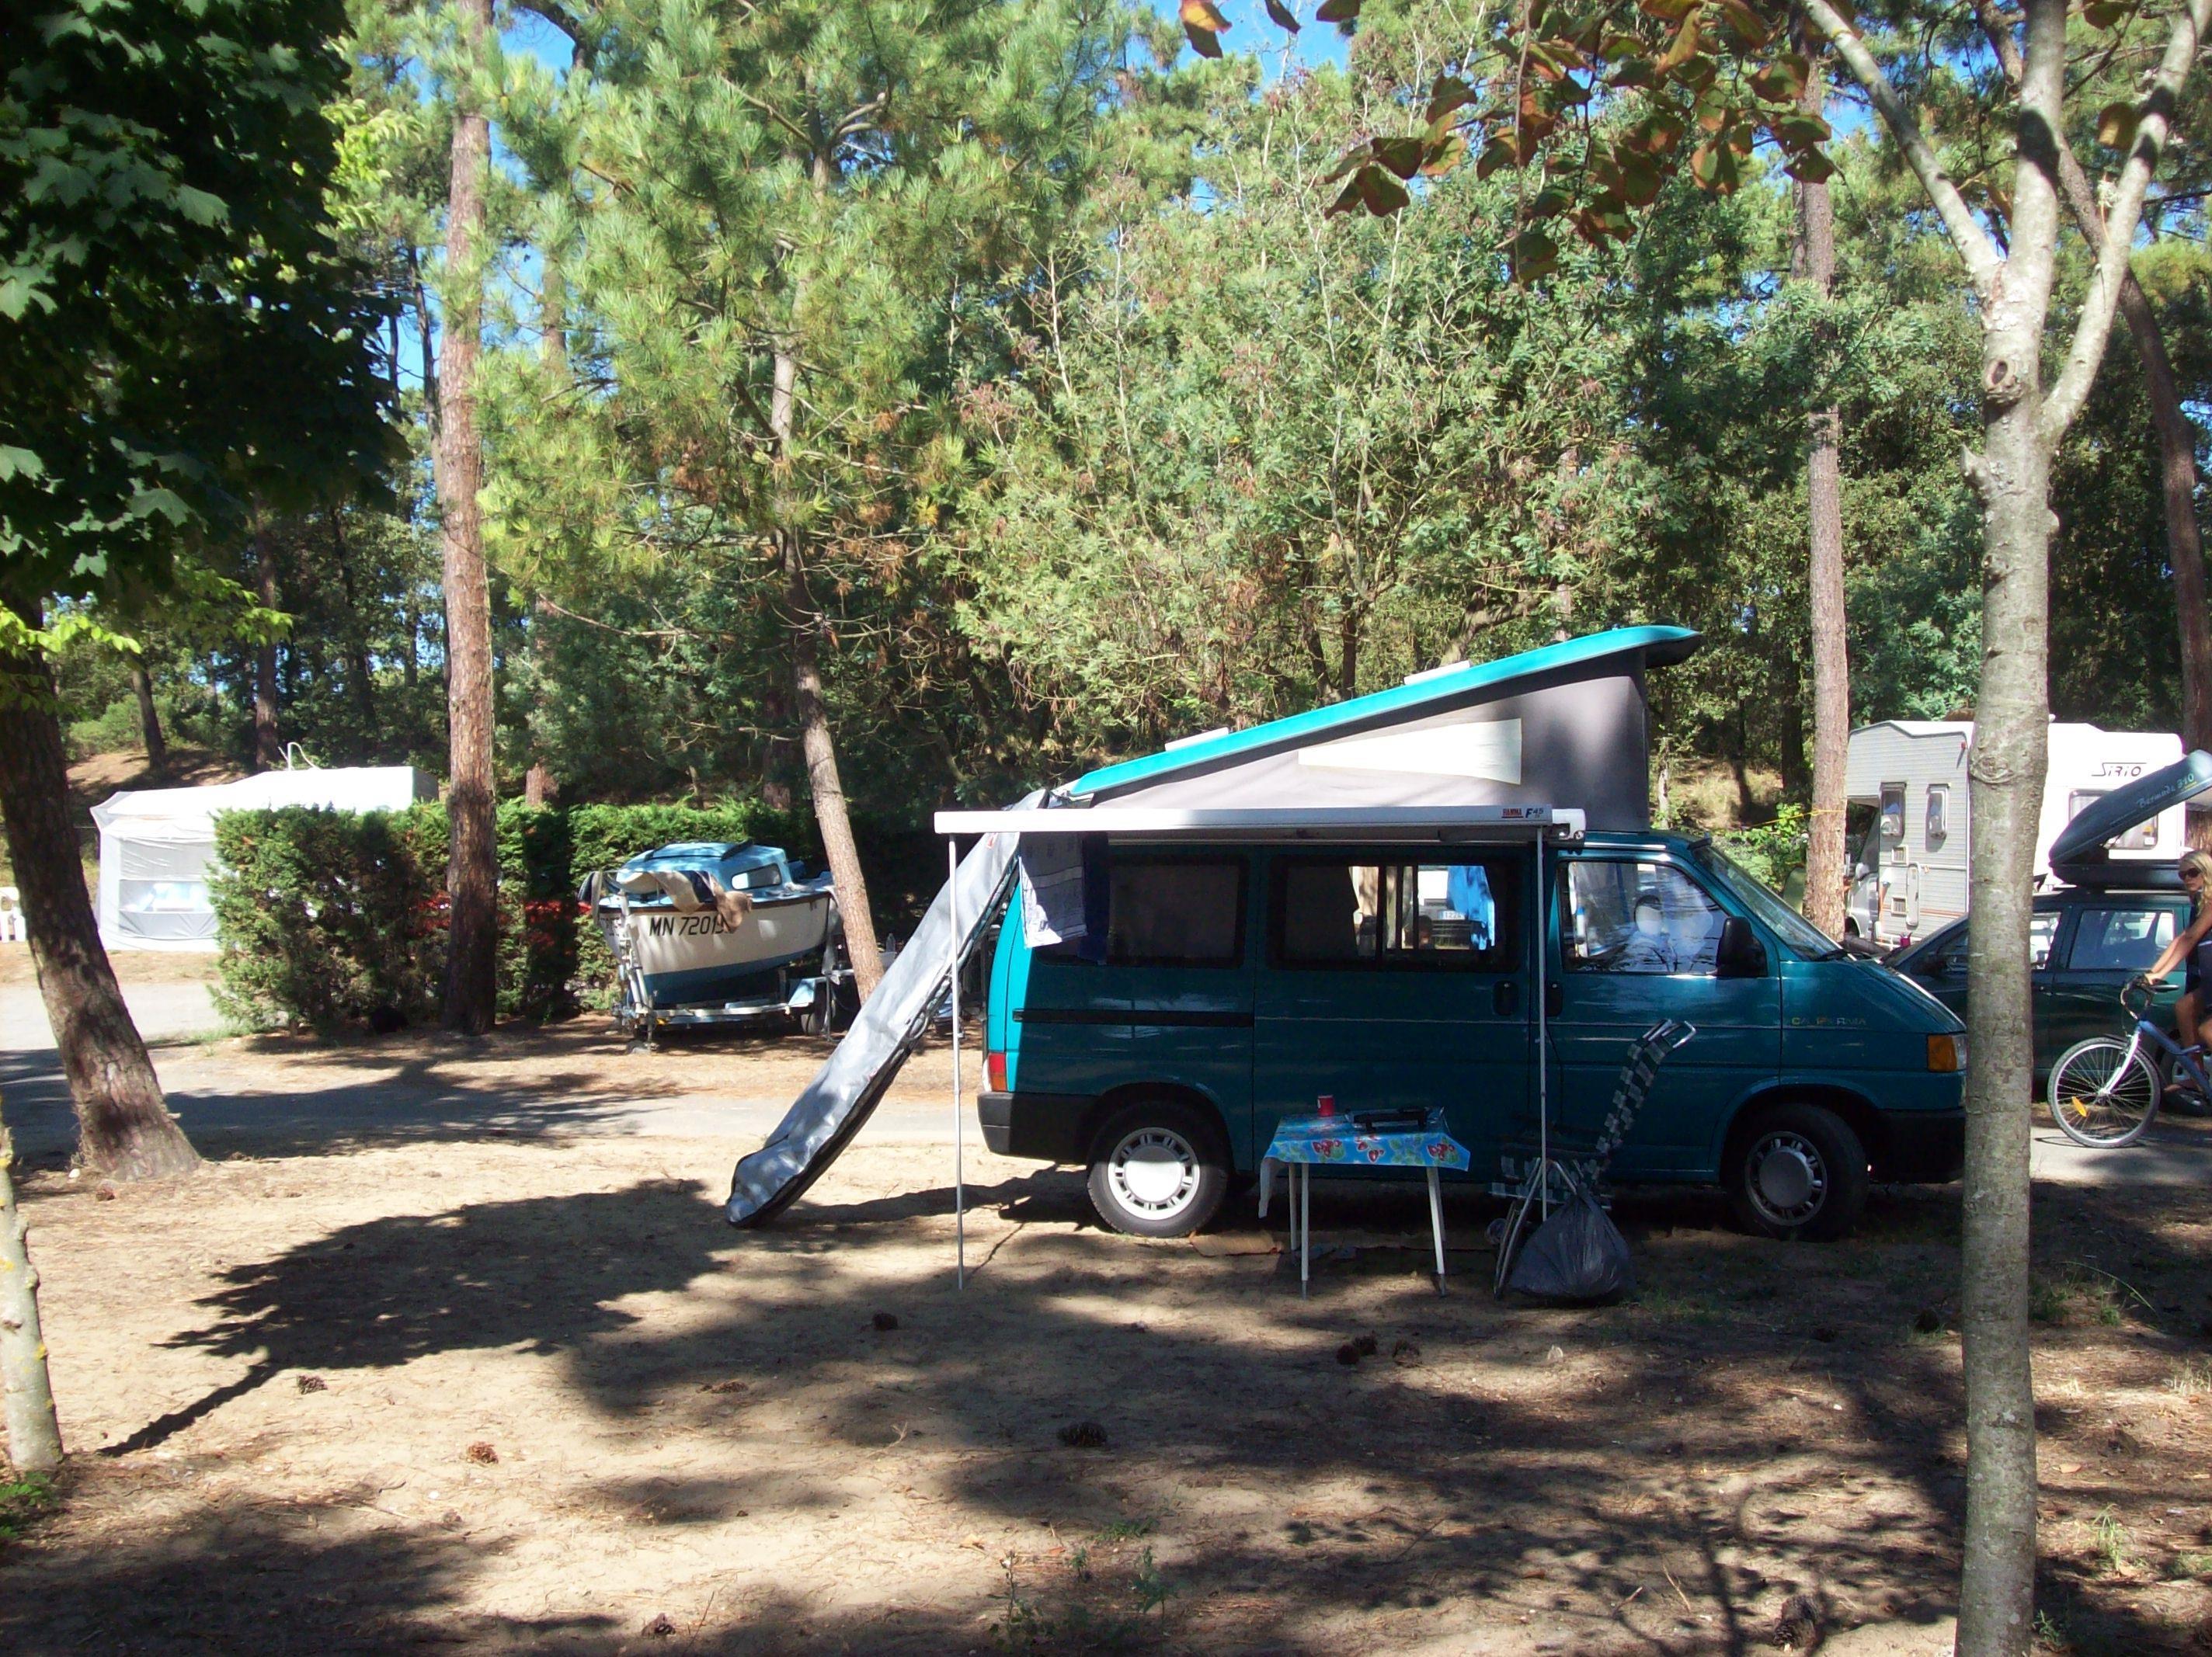 Emplacement - Emplacement Eden Branché - Camping-Club Les Pins